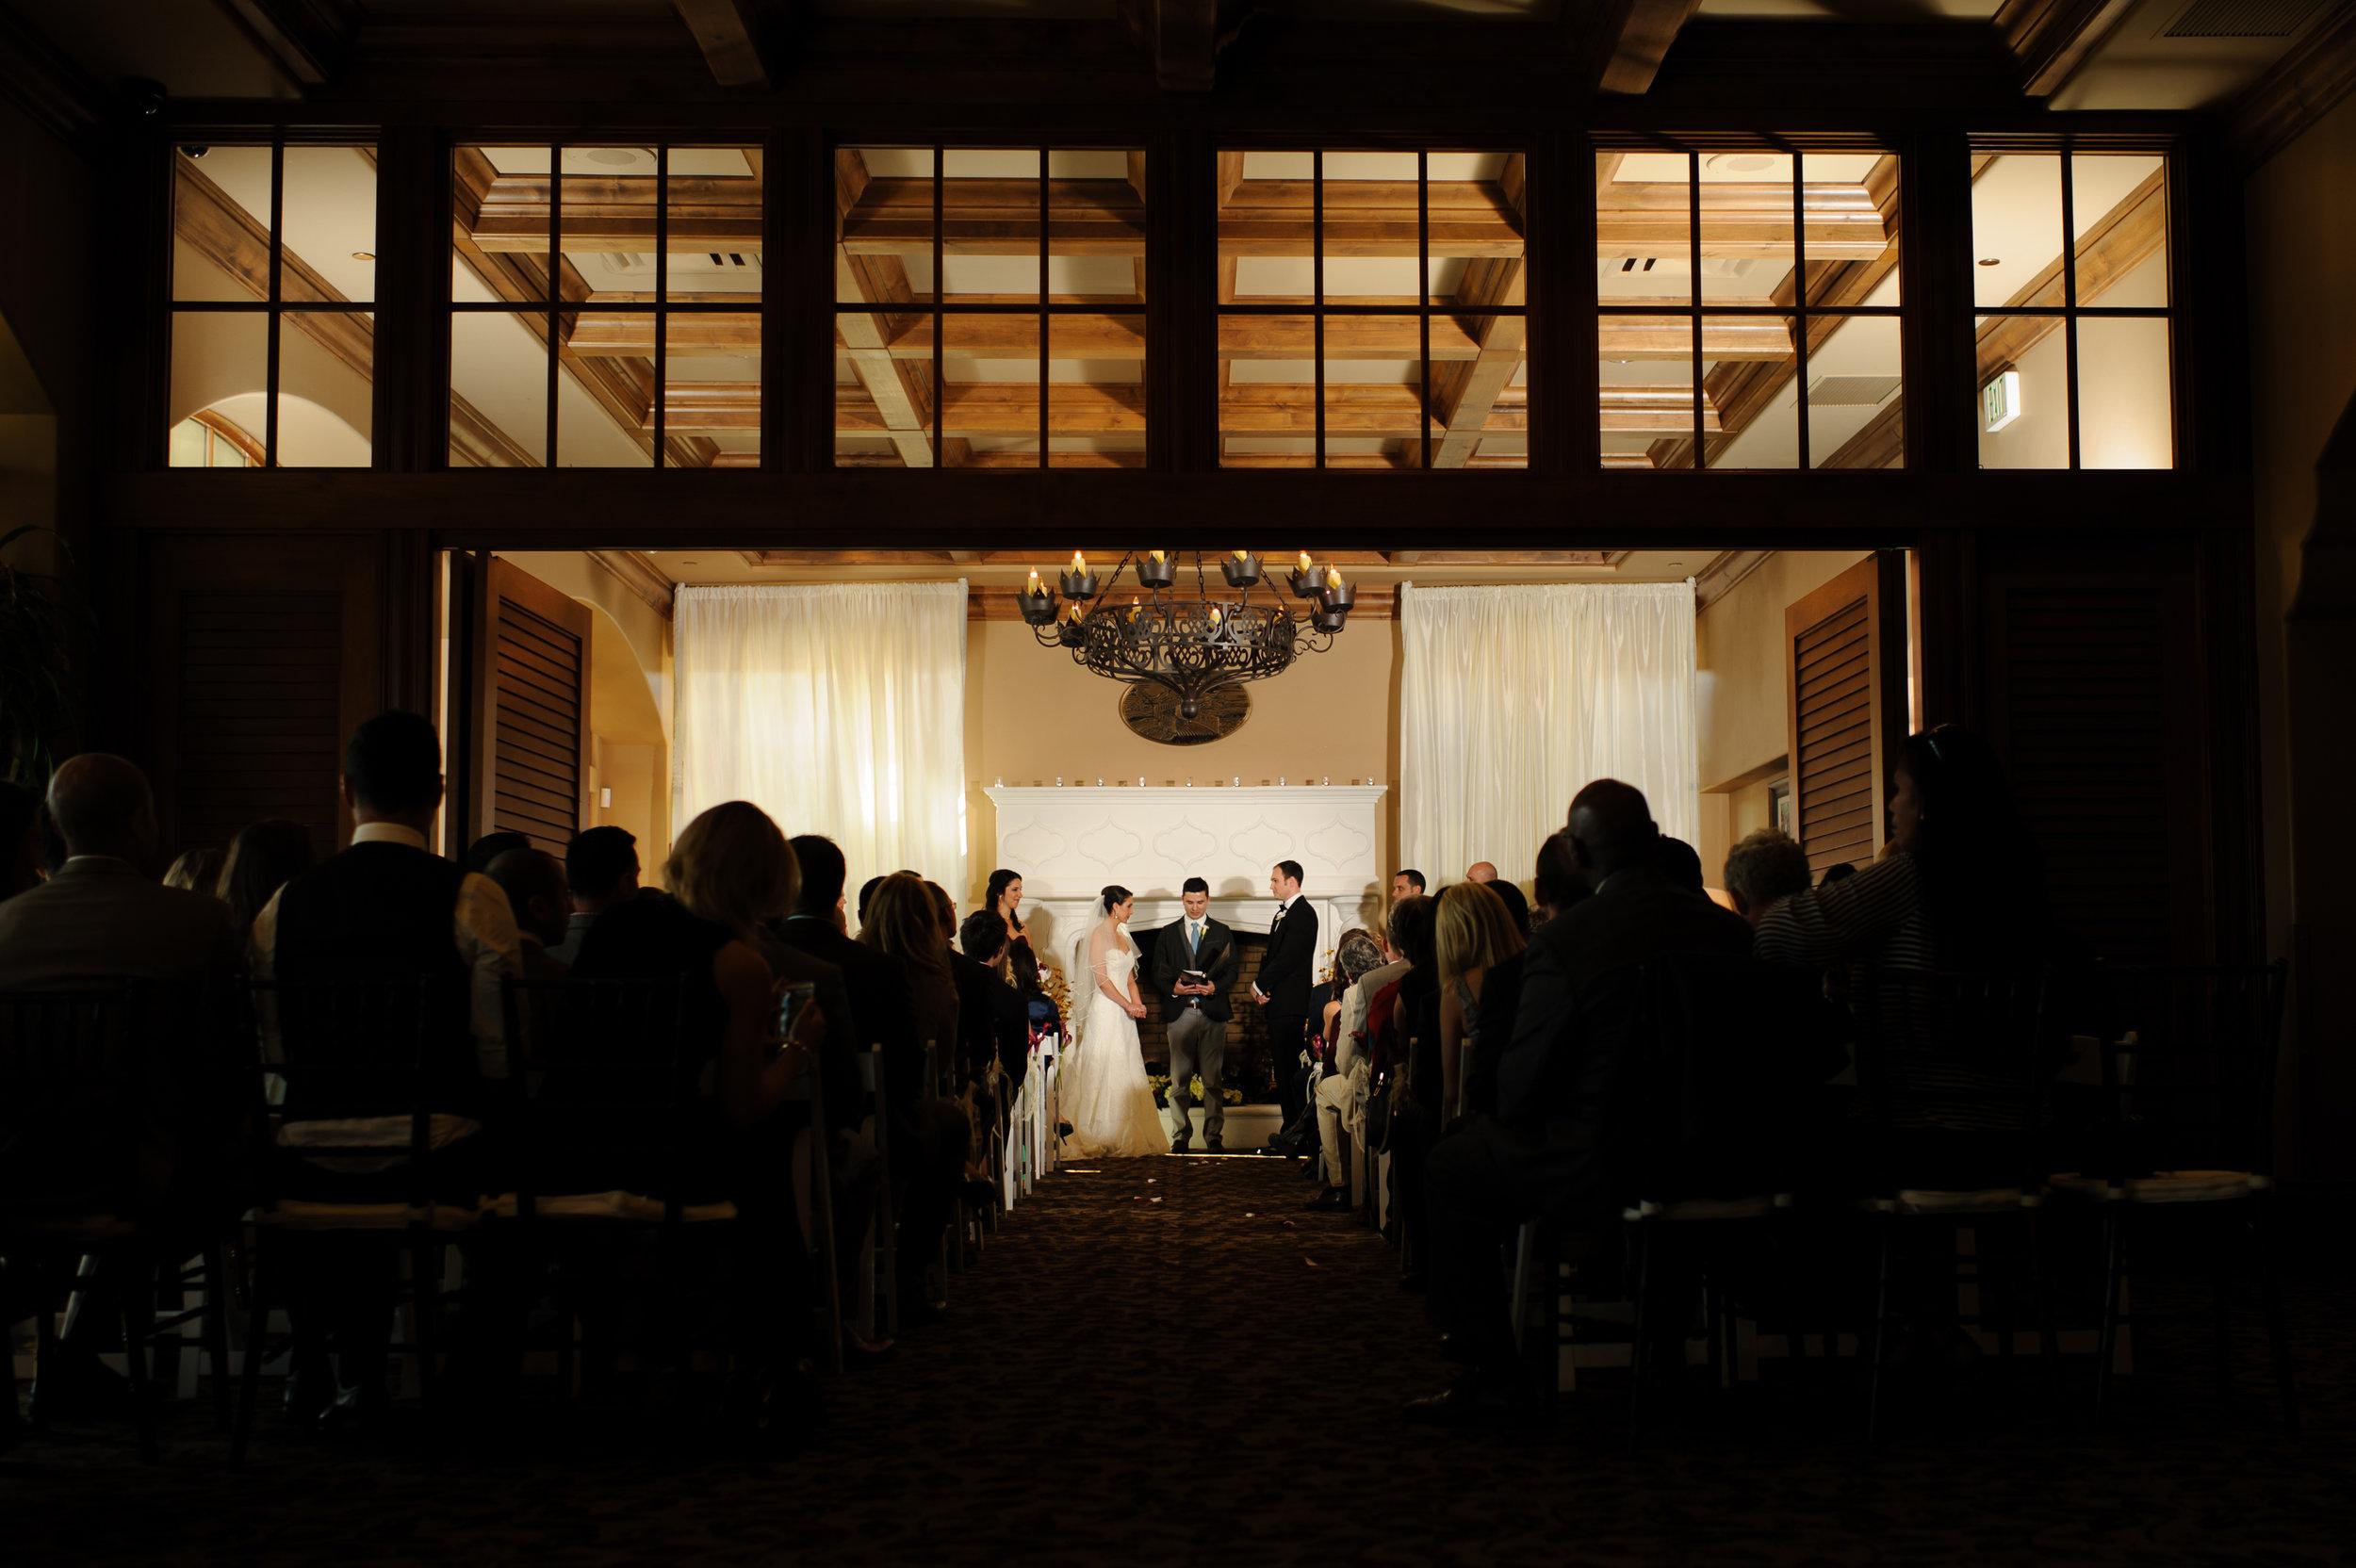 lindsey-jake-018-the-bridges-golf-course-san-ramon-wedding-photographer-katherine-nicole-photography.JPG